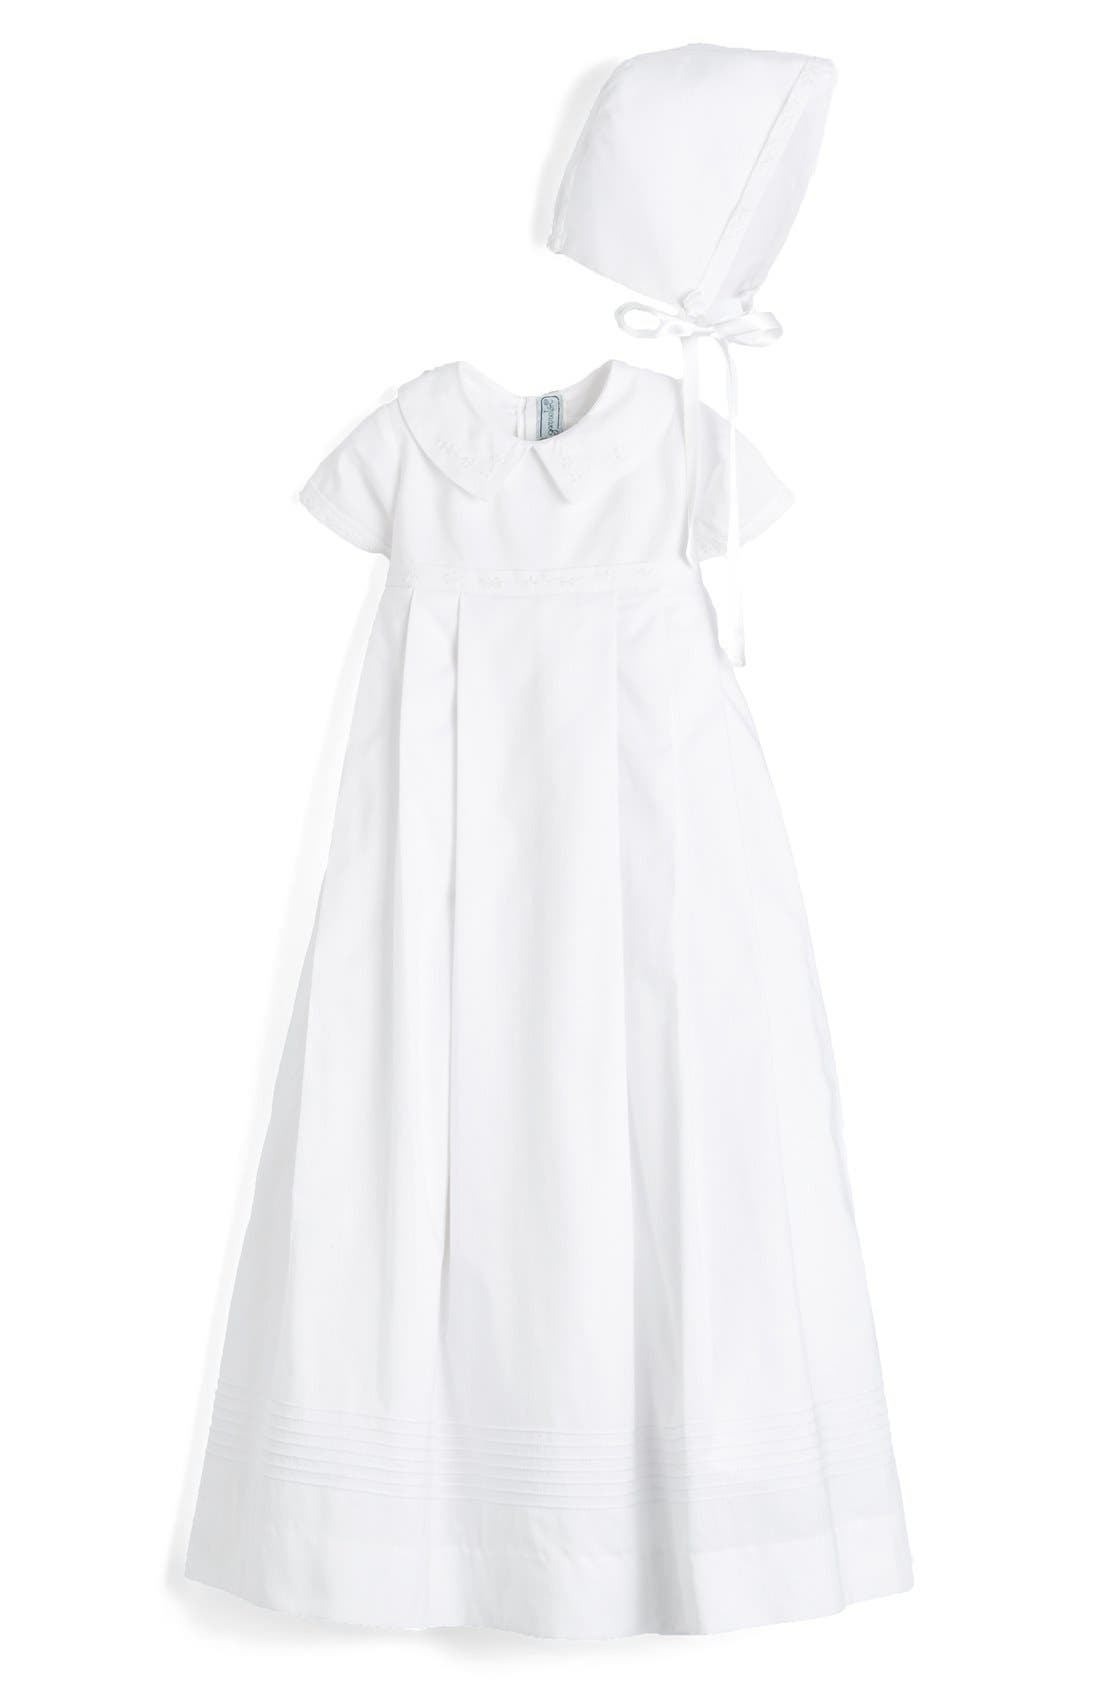 'Classic' Christening Gown & Bonnet,                         Main,                         color, WHITE